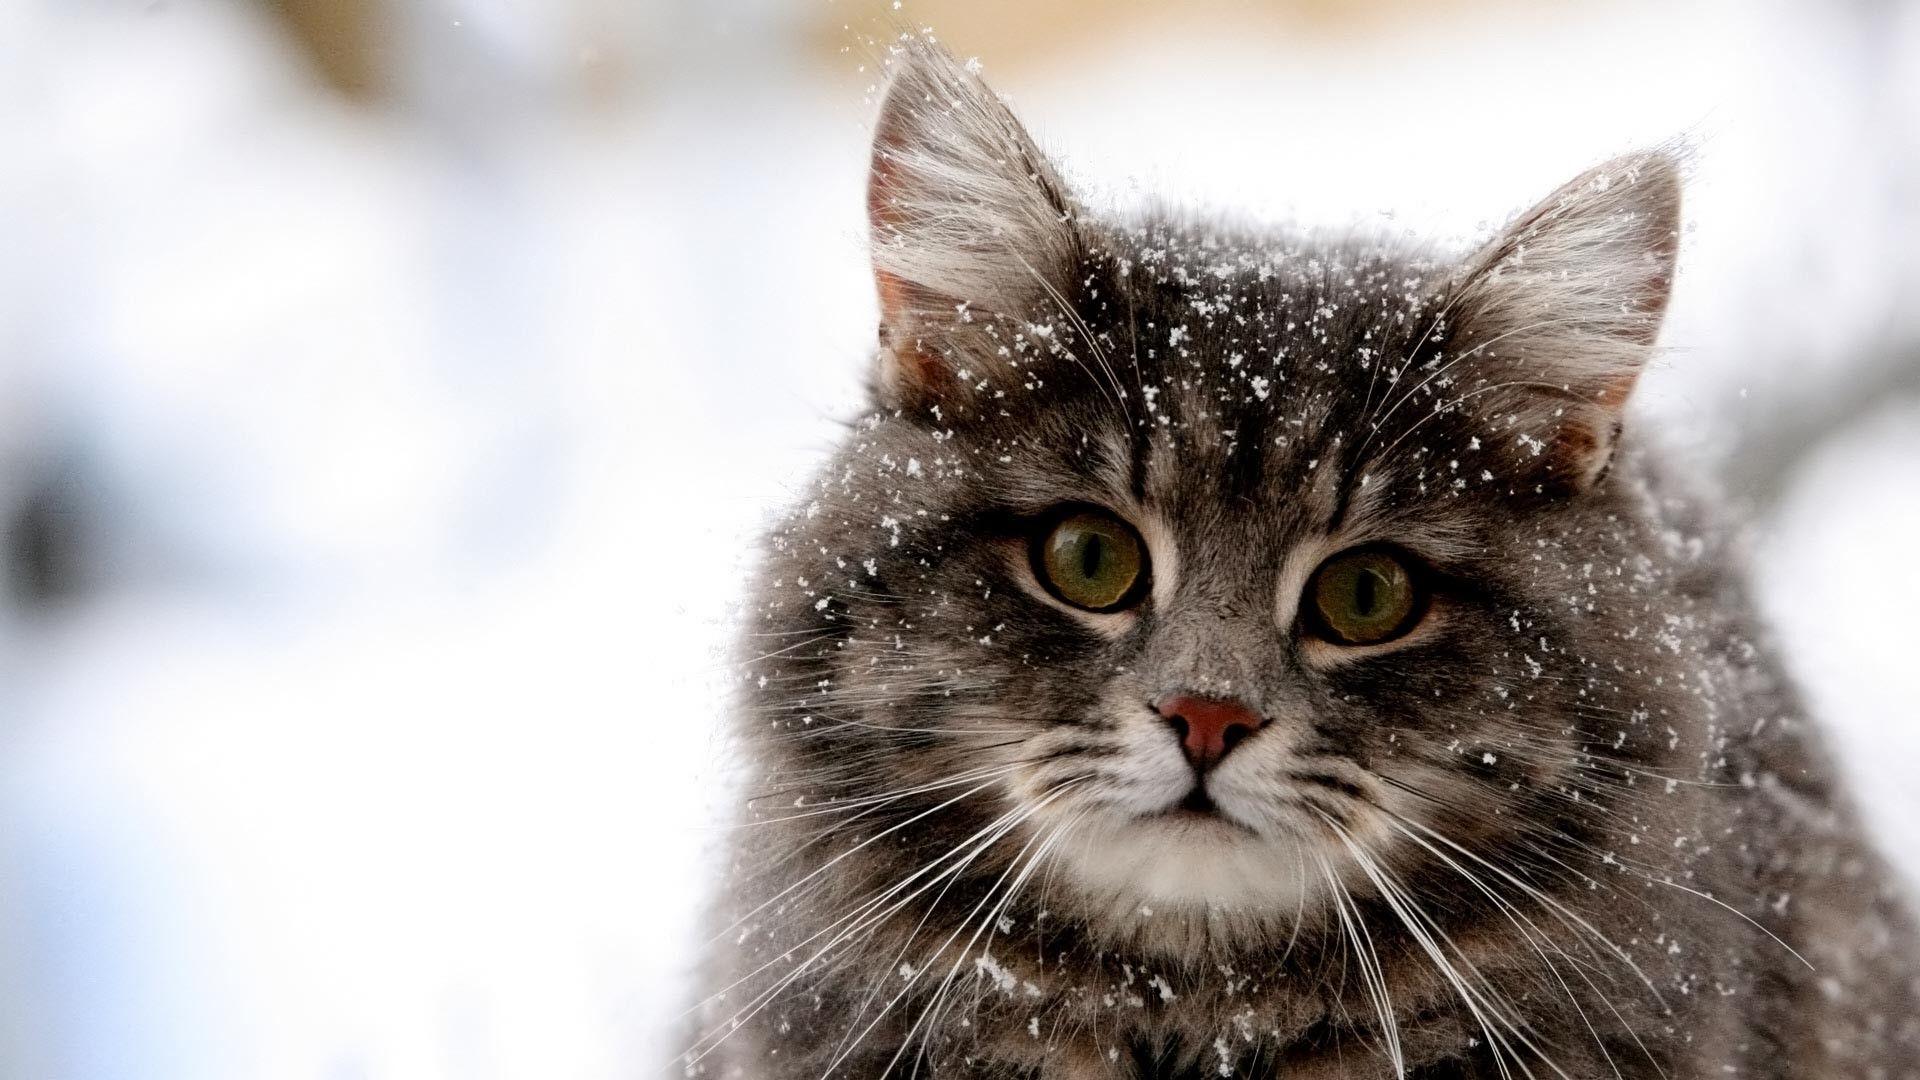 48 Cute Winter Animal Wallpaper Background Photos Hd Images Kucing Wallpaper Kucing Binatang